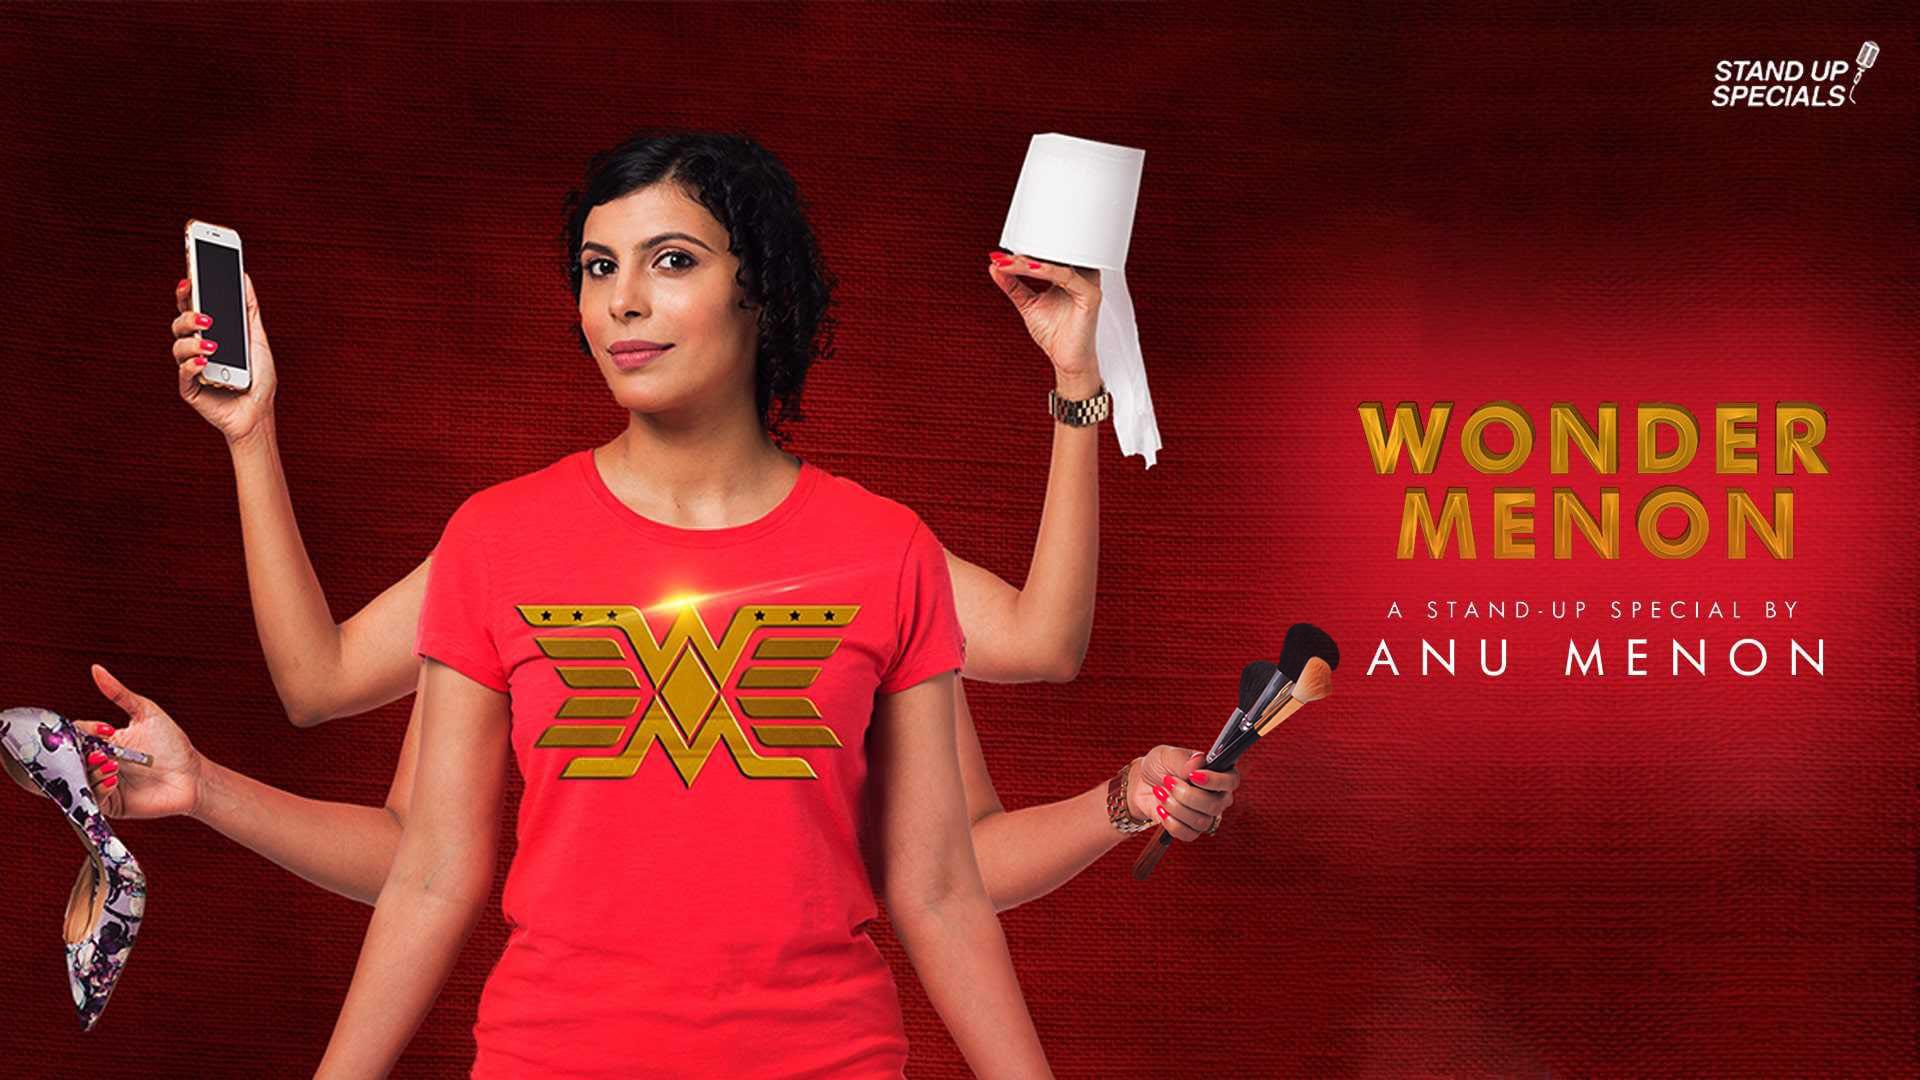 Anu Menon: Wonder Menon